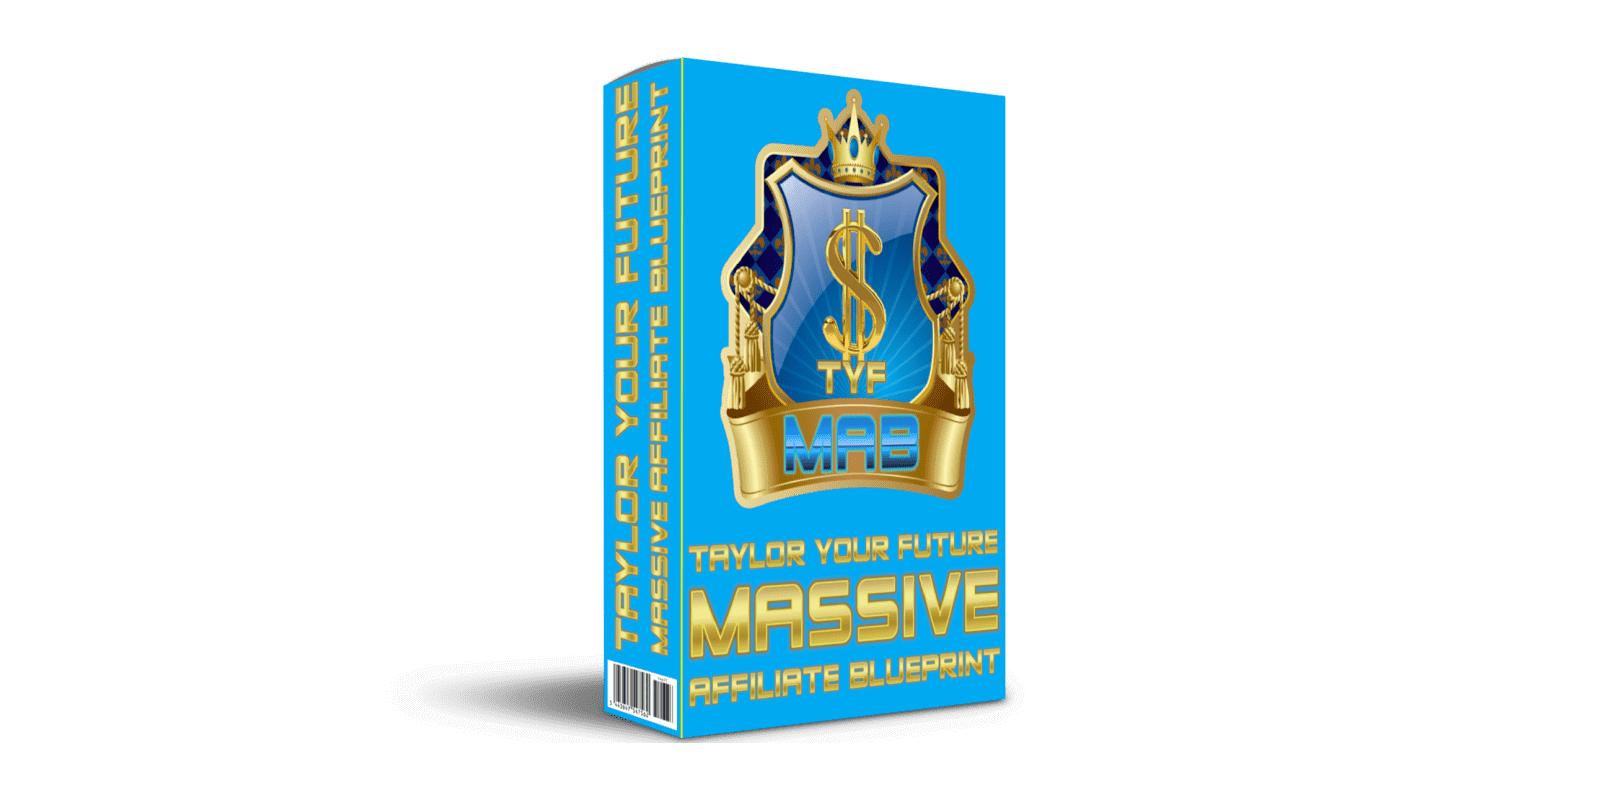 Massive Affiliate blueprint 1.0 Review